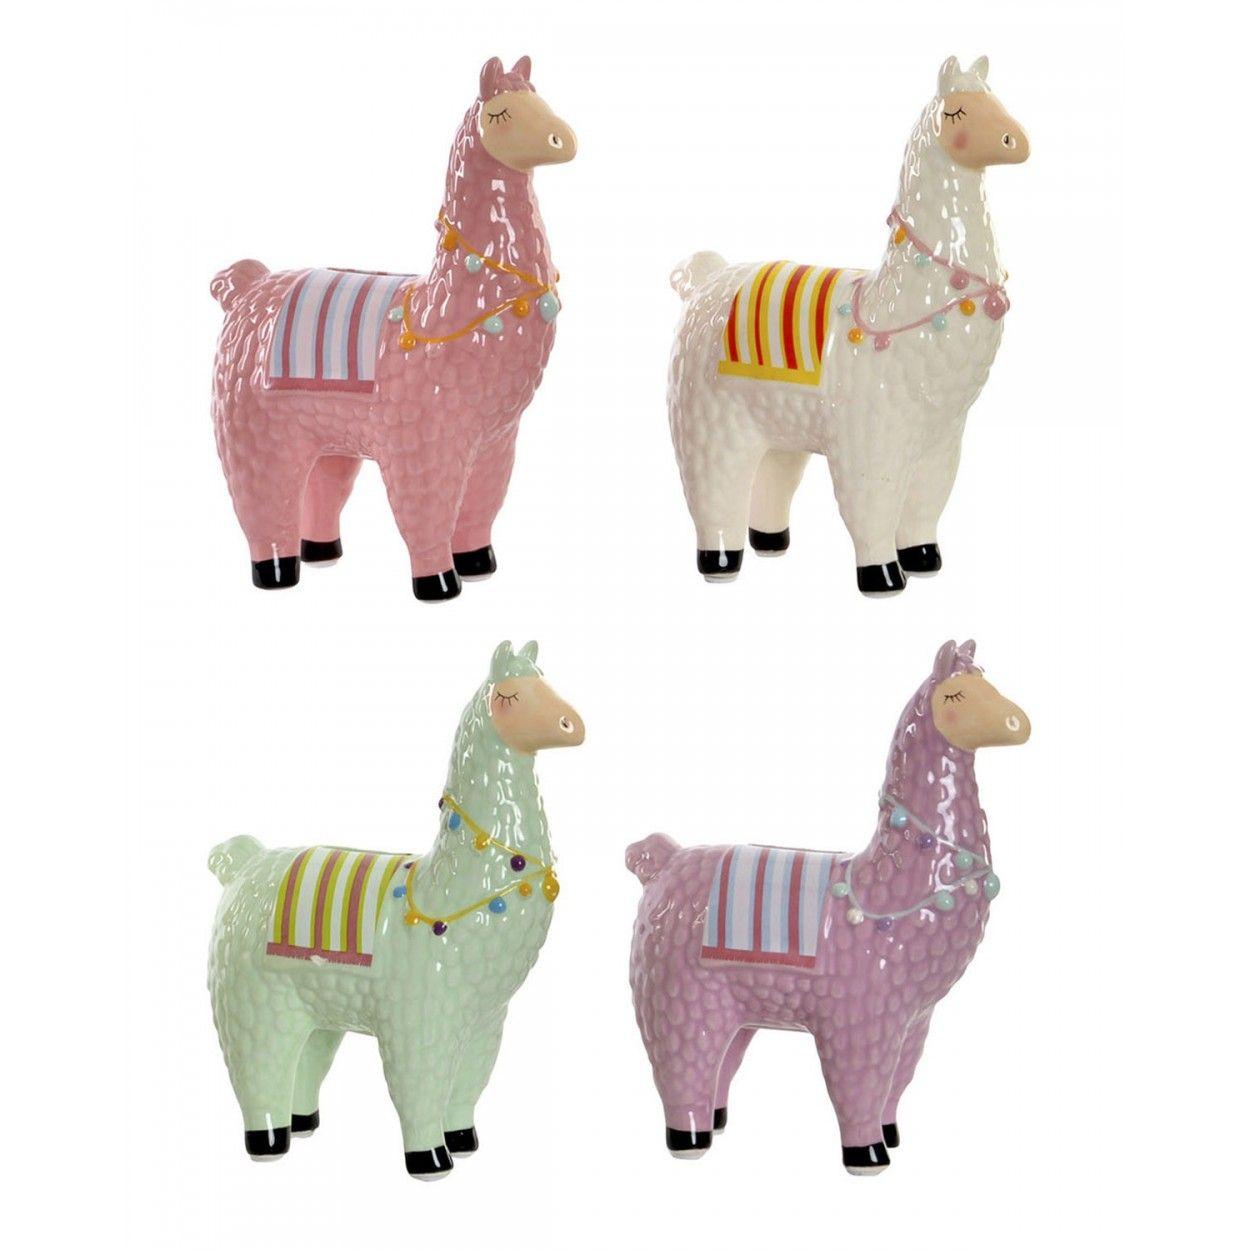 Hucha Llama//Alpaca de Porcelana Hay 4 Colores a Elegir Original//Colorida de Estilo Infantil 12X6X19 cm.-Hogarymas- Amarillo